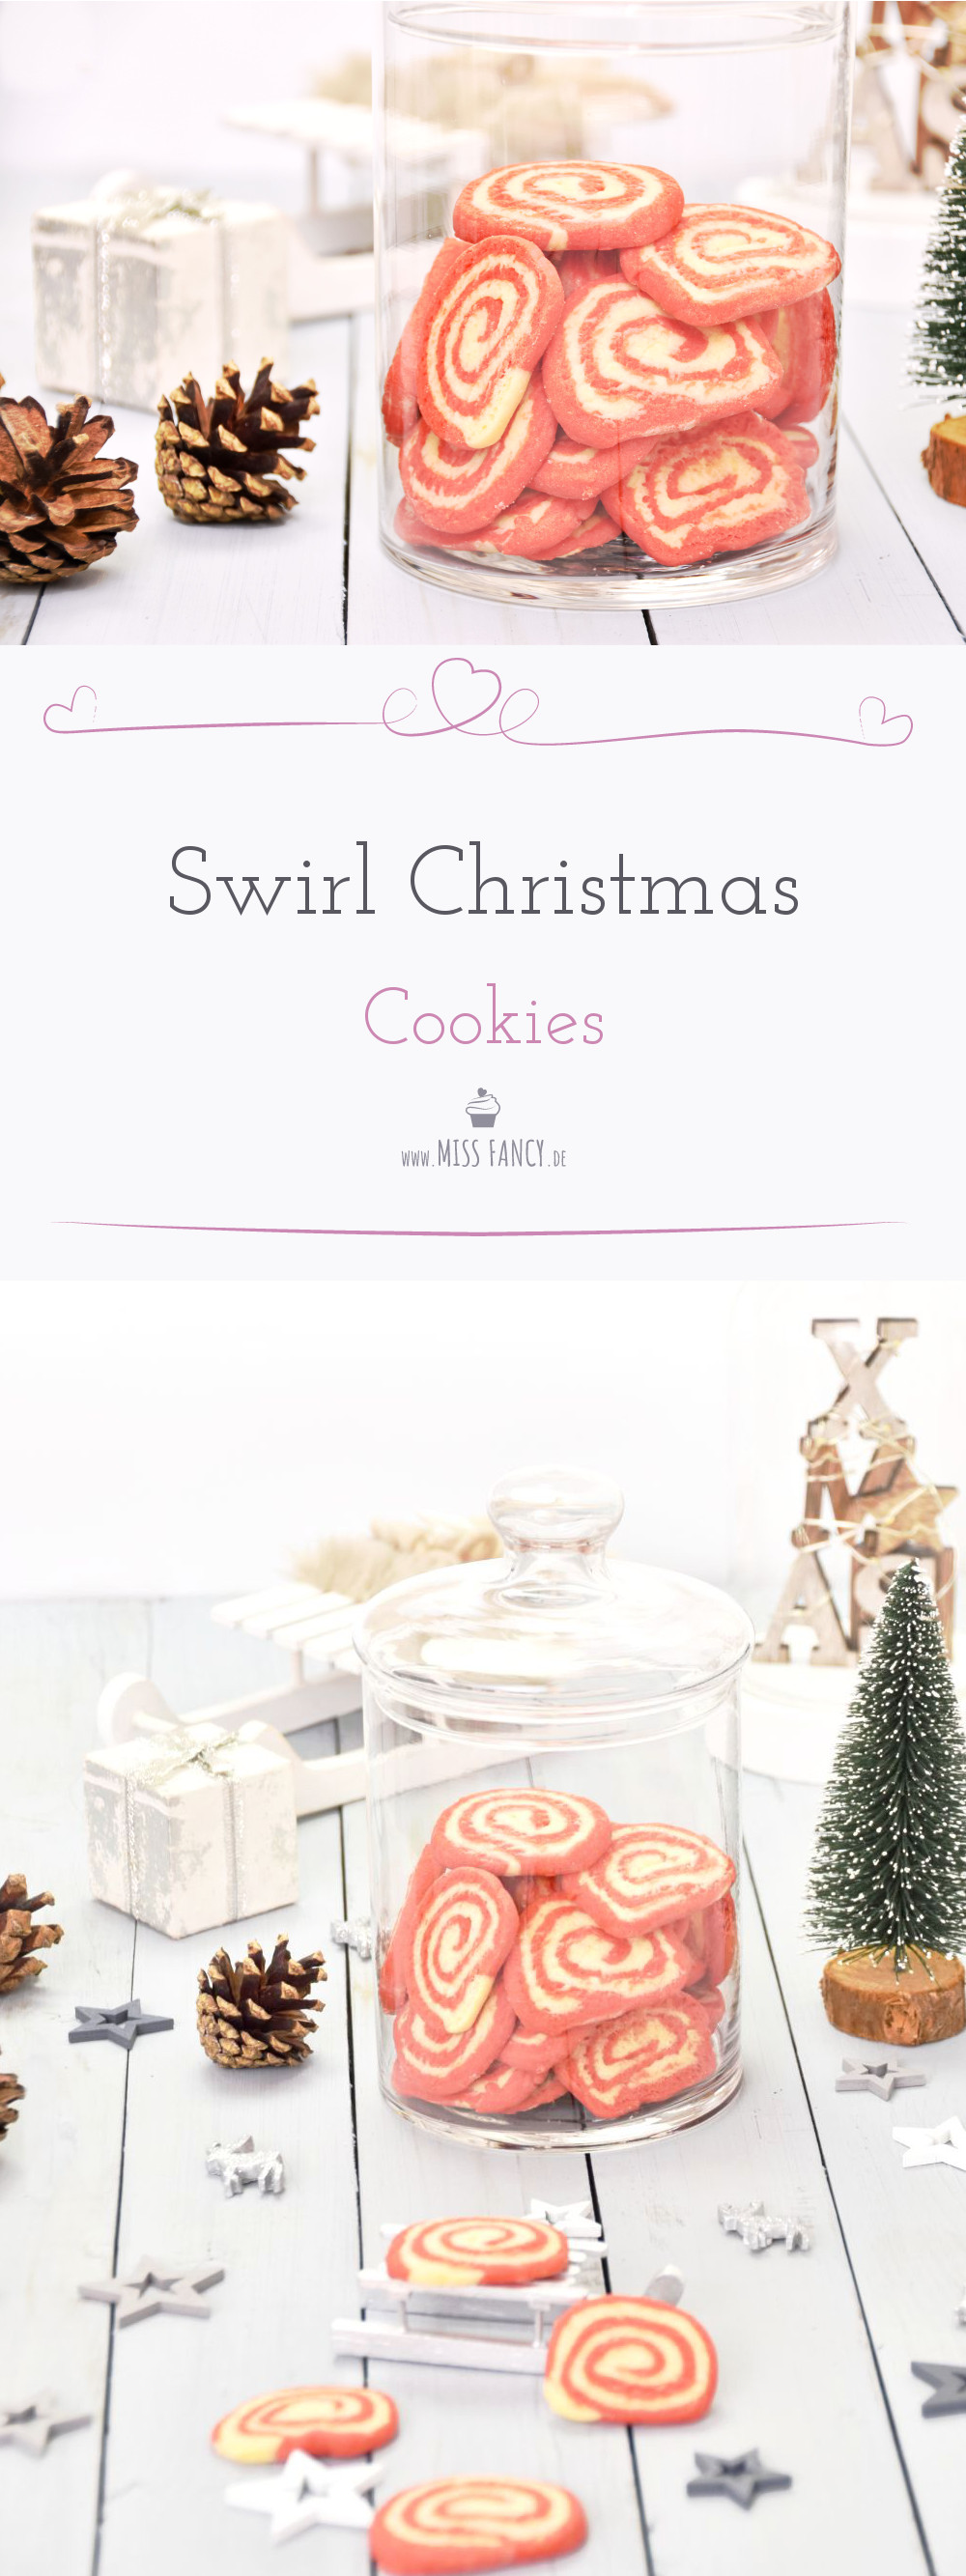 Rezept Nikolaus Rot-Weiß Weihnachtsplätzchen Cookies